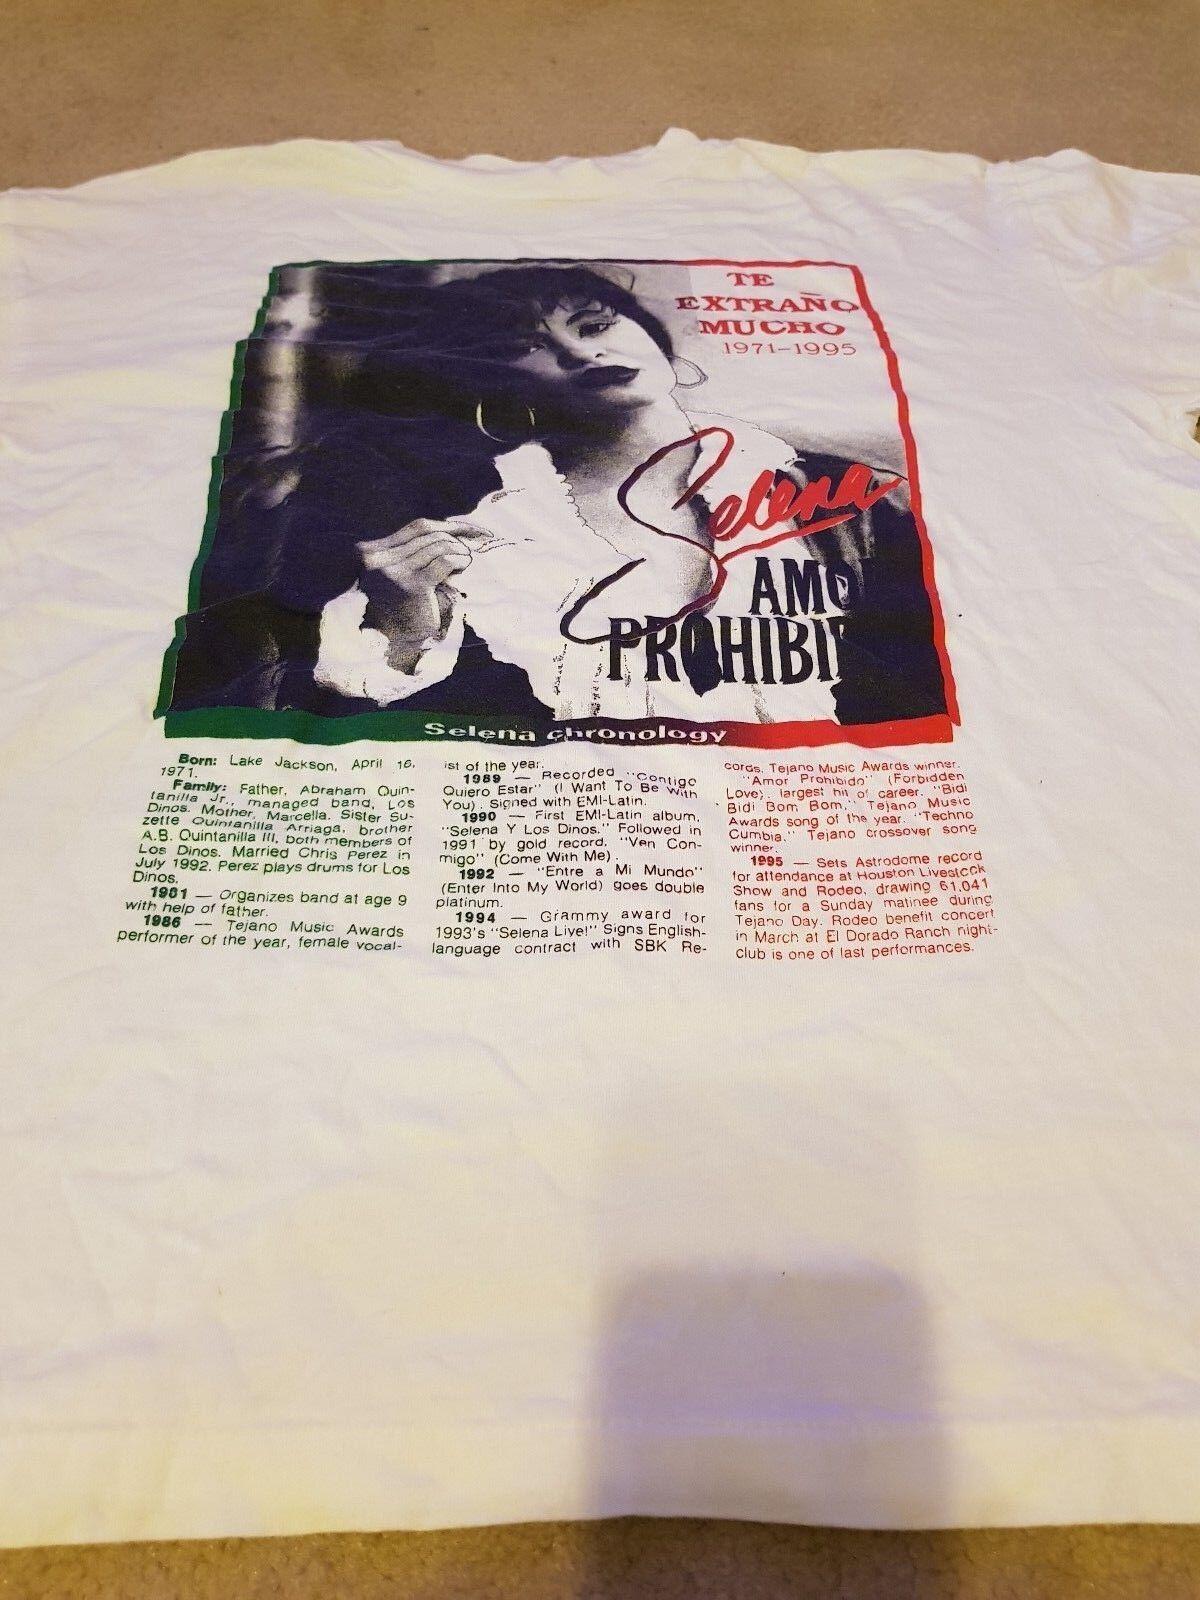 Vintage Selena Te Extrano Mucho 1971-1995 T-Shirt MEGA RARE  XL Great condition